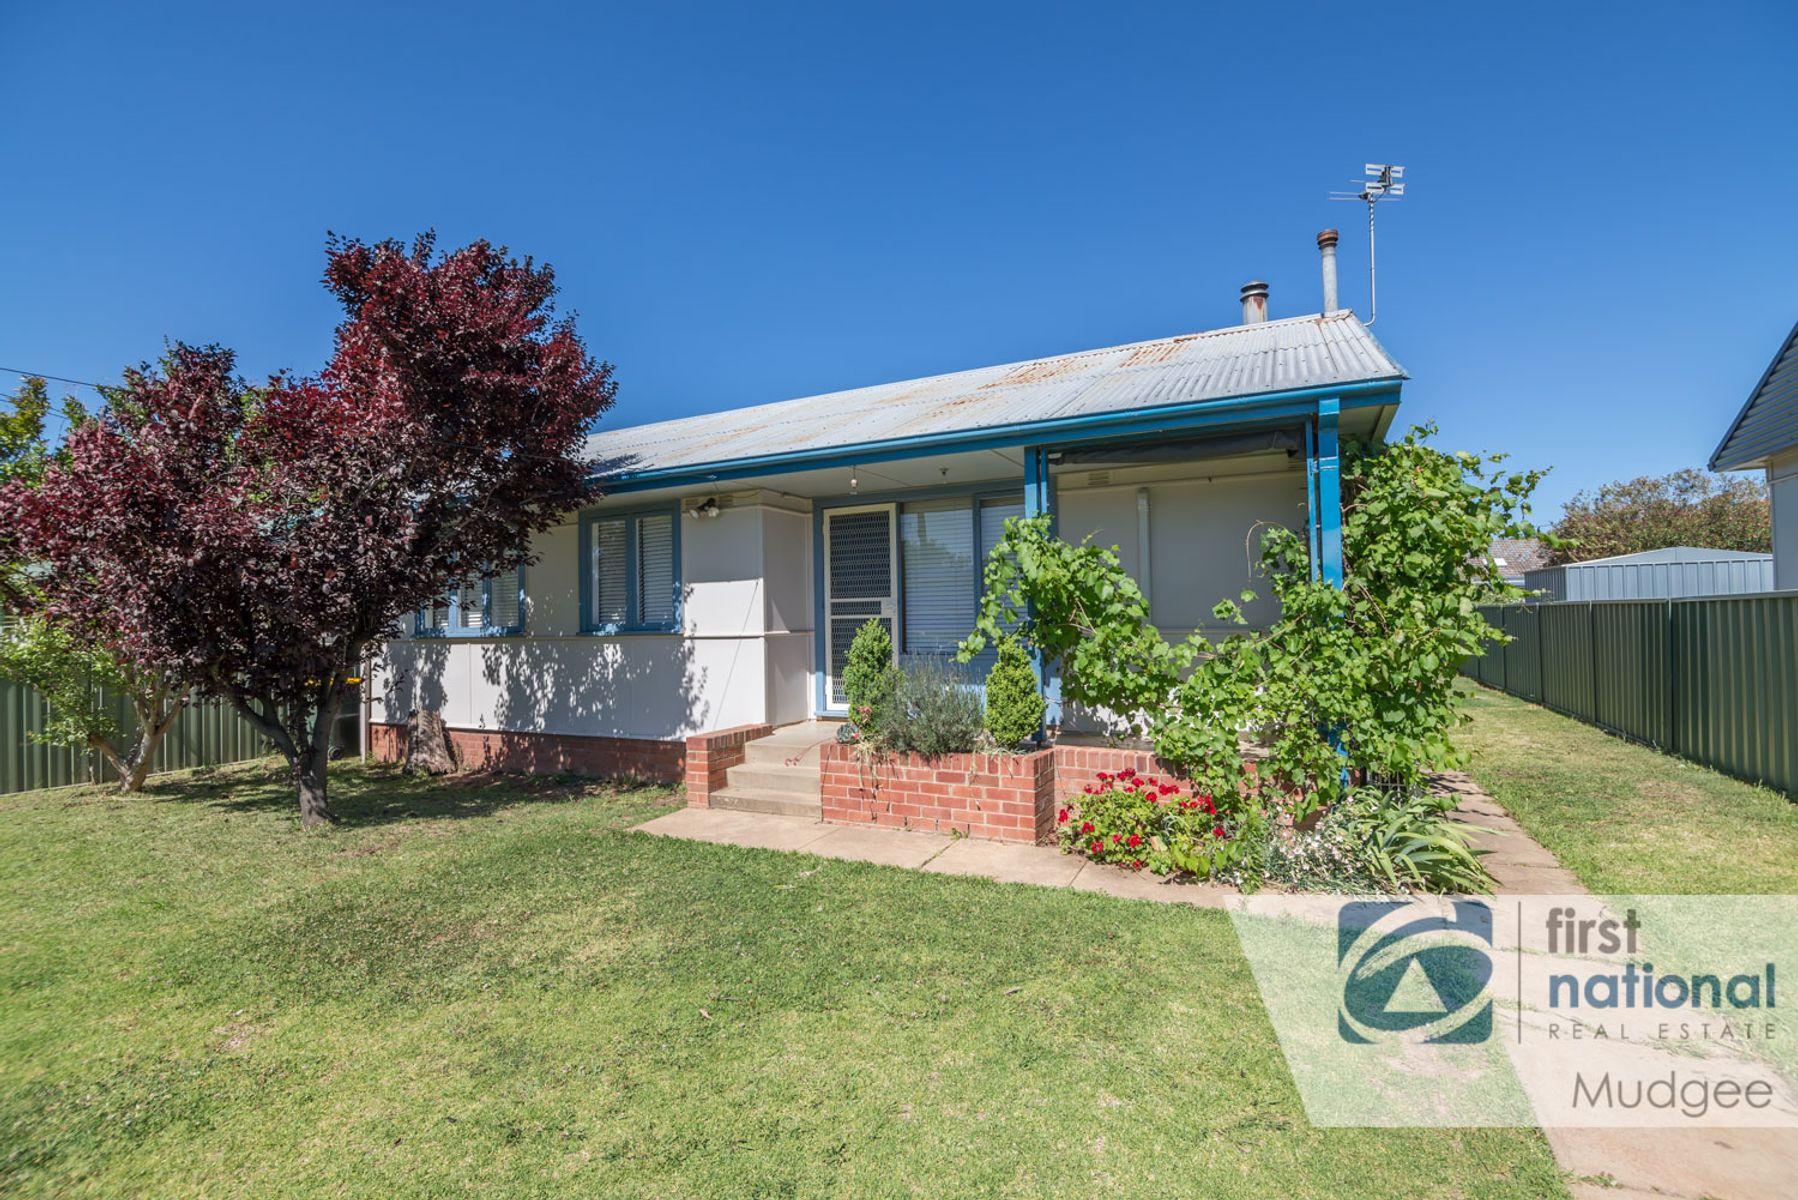 43 Burrundulla Avenue, Mudgee, NSW 2850